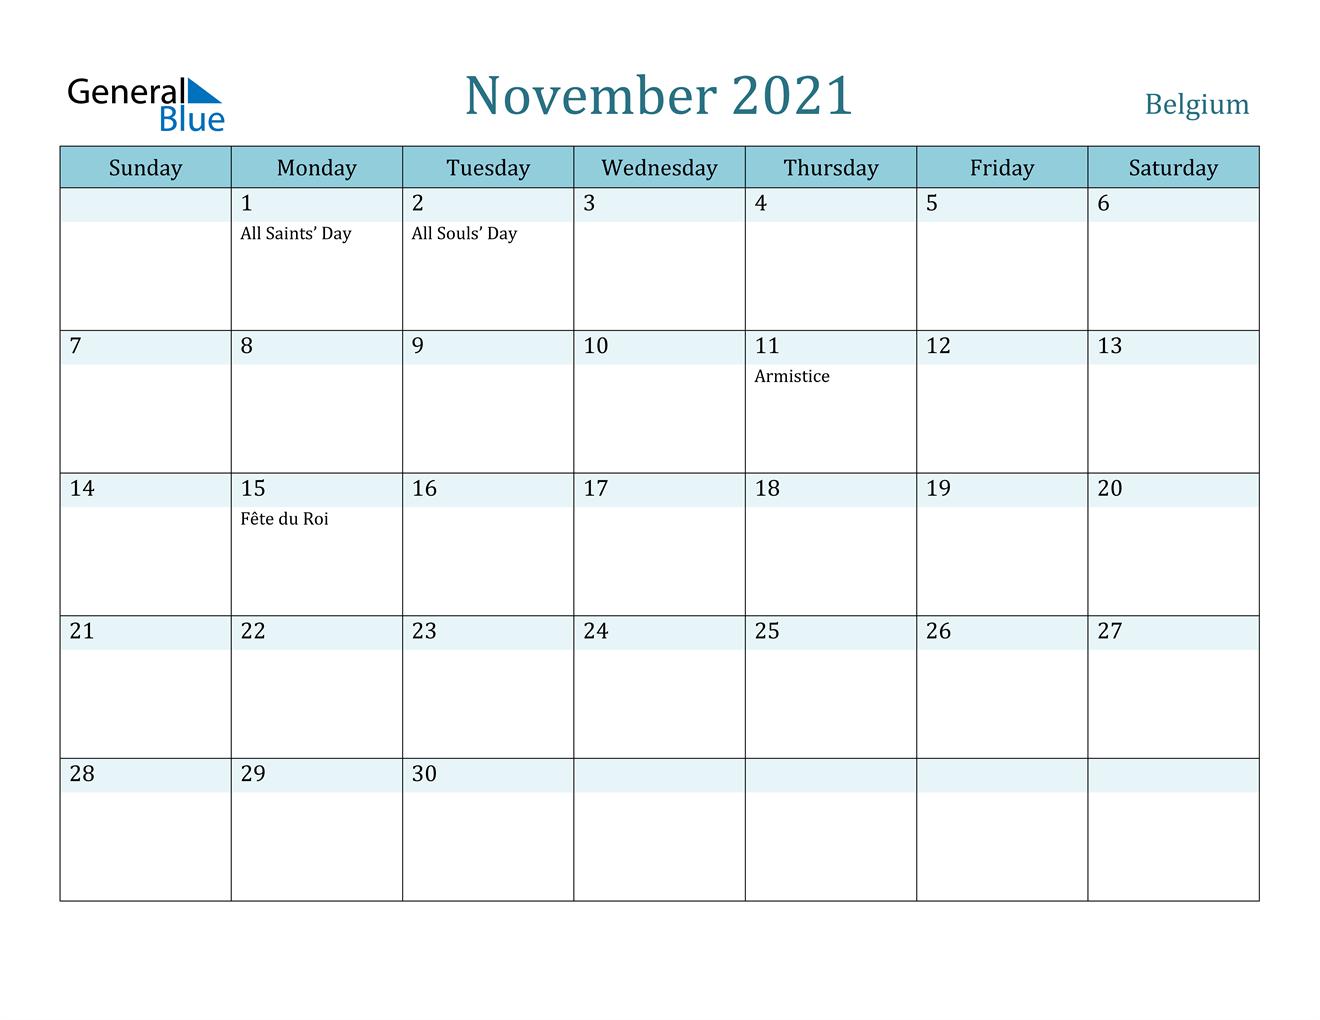 November 2021 Calendar - Belgium